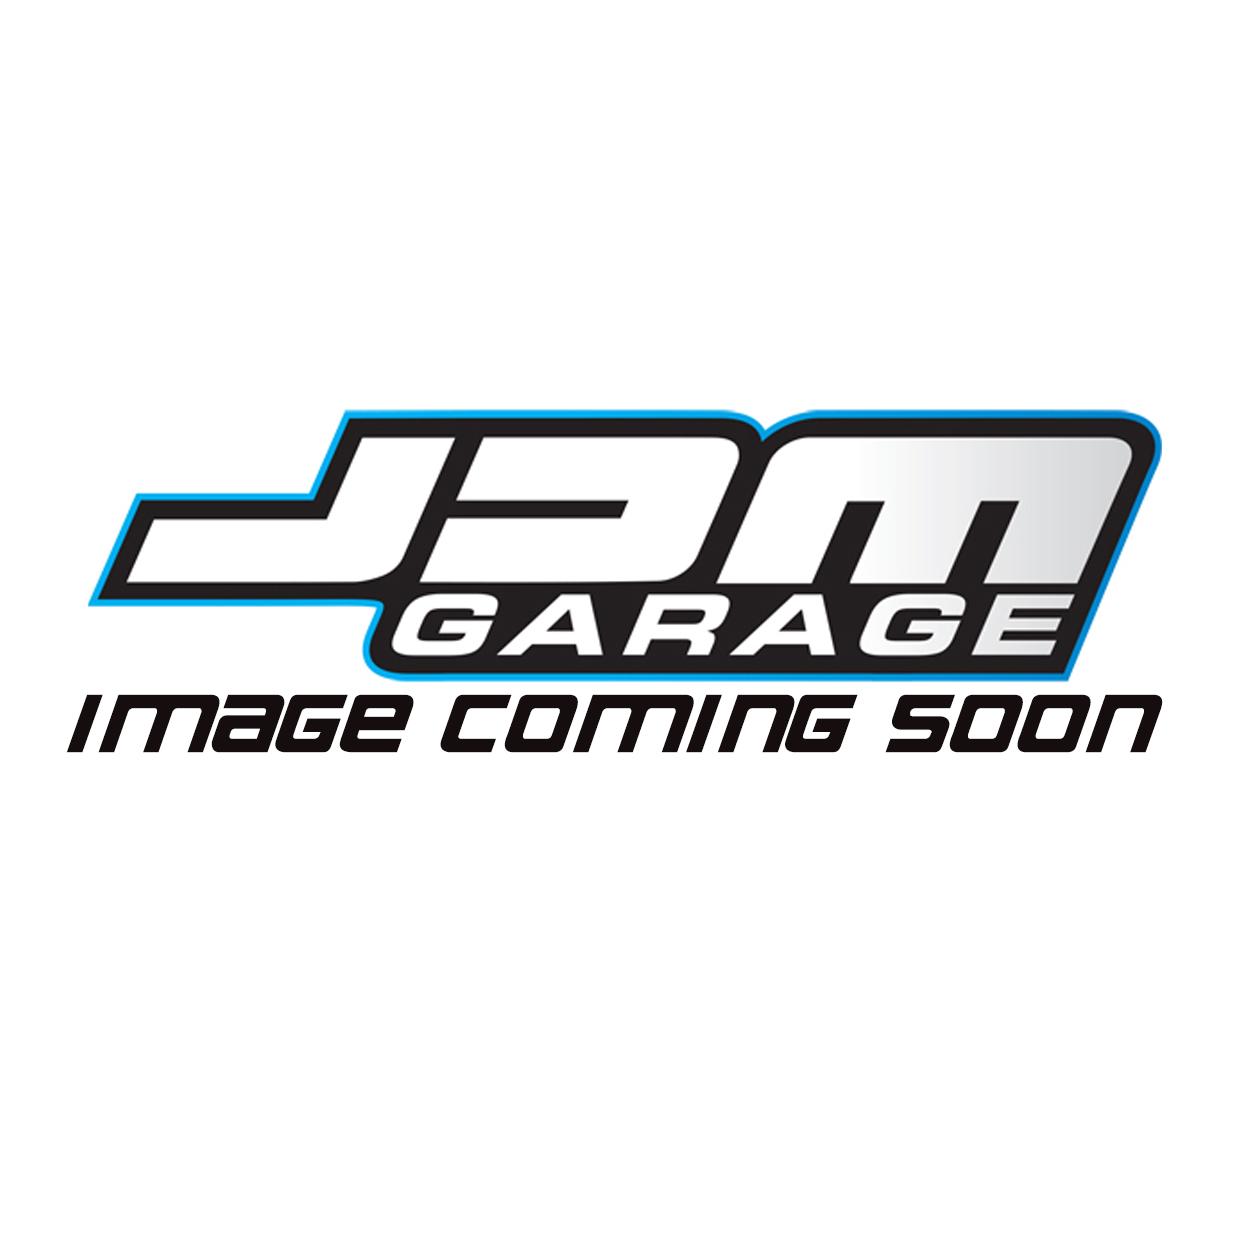 ATI Super Damper Crank Pulley - Fits Nissan Skyline R32 R33 R34 GTR RB26DETT / R35 GT-R / Silvia S13 S14 S15 / 350z / Toyota 1JZ 2JZ GTE